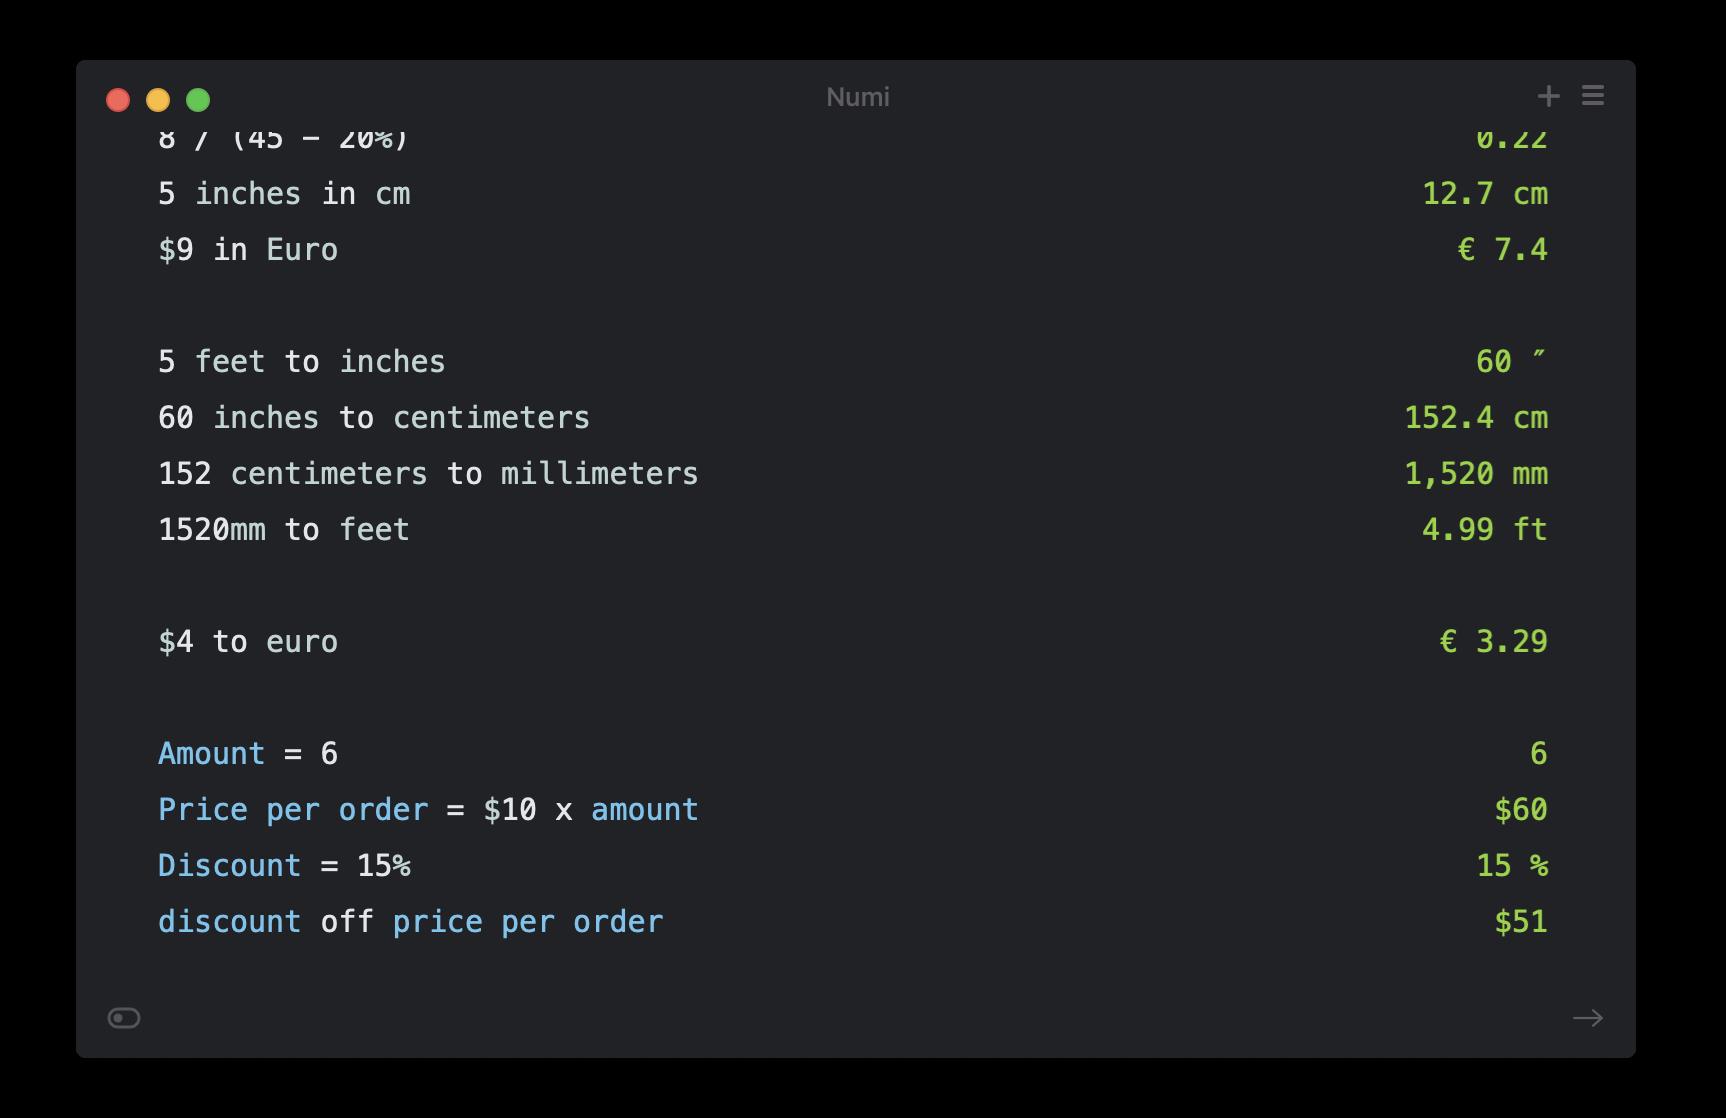 numi-algebra-app-mac